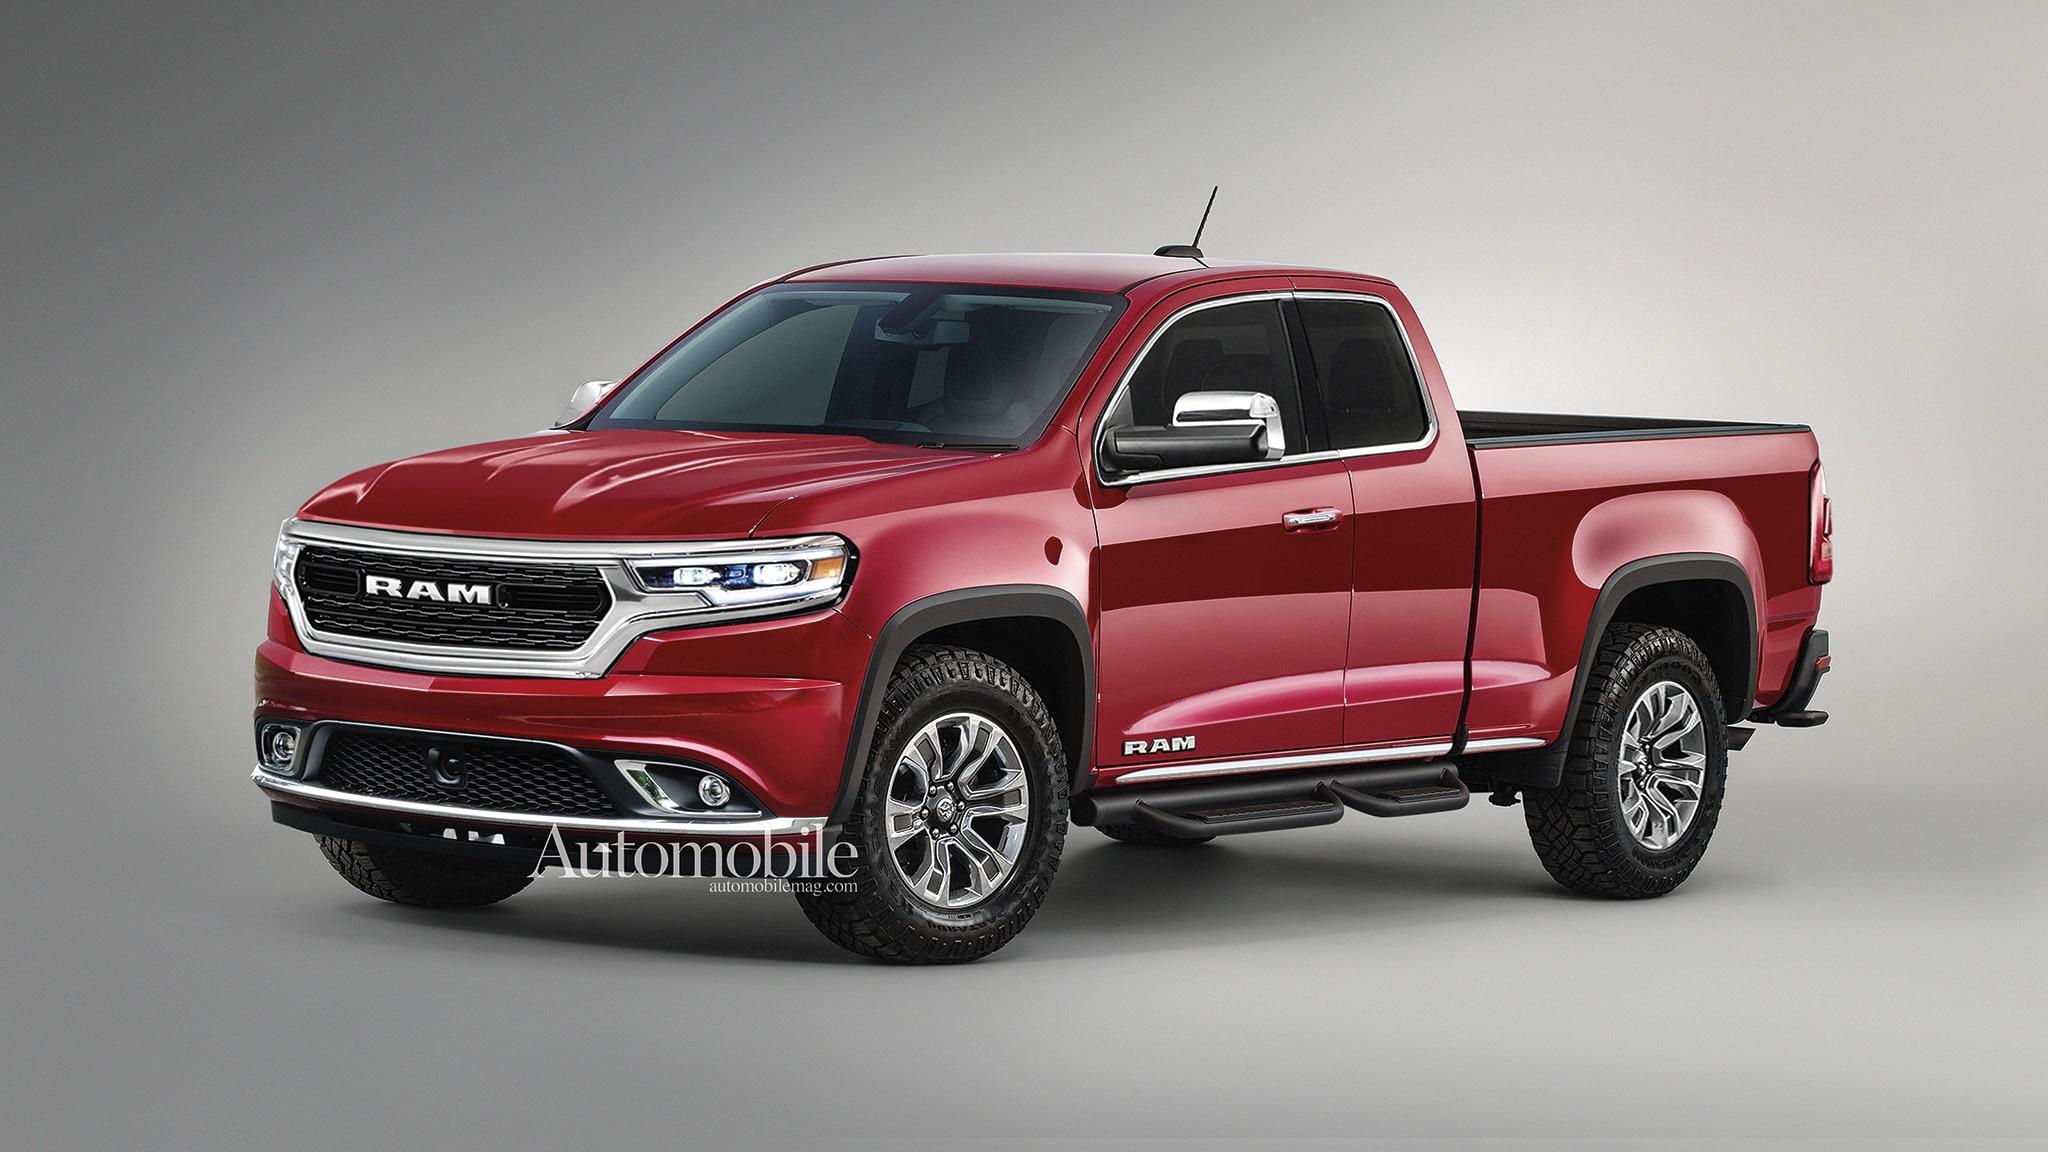 2021 Ram Dakota Midsize Pickup Truck Renderings Rumors